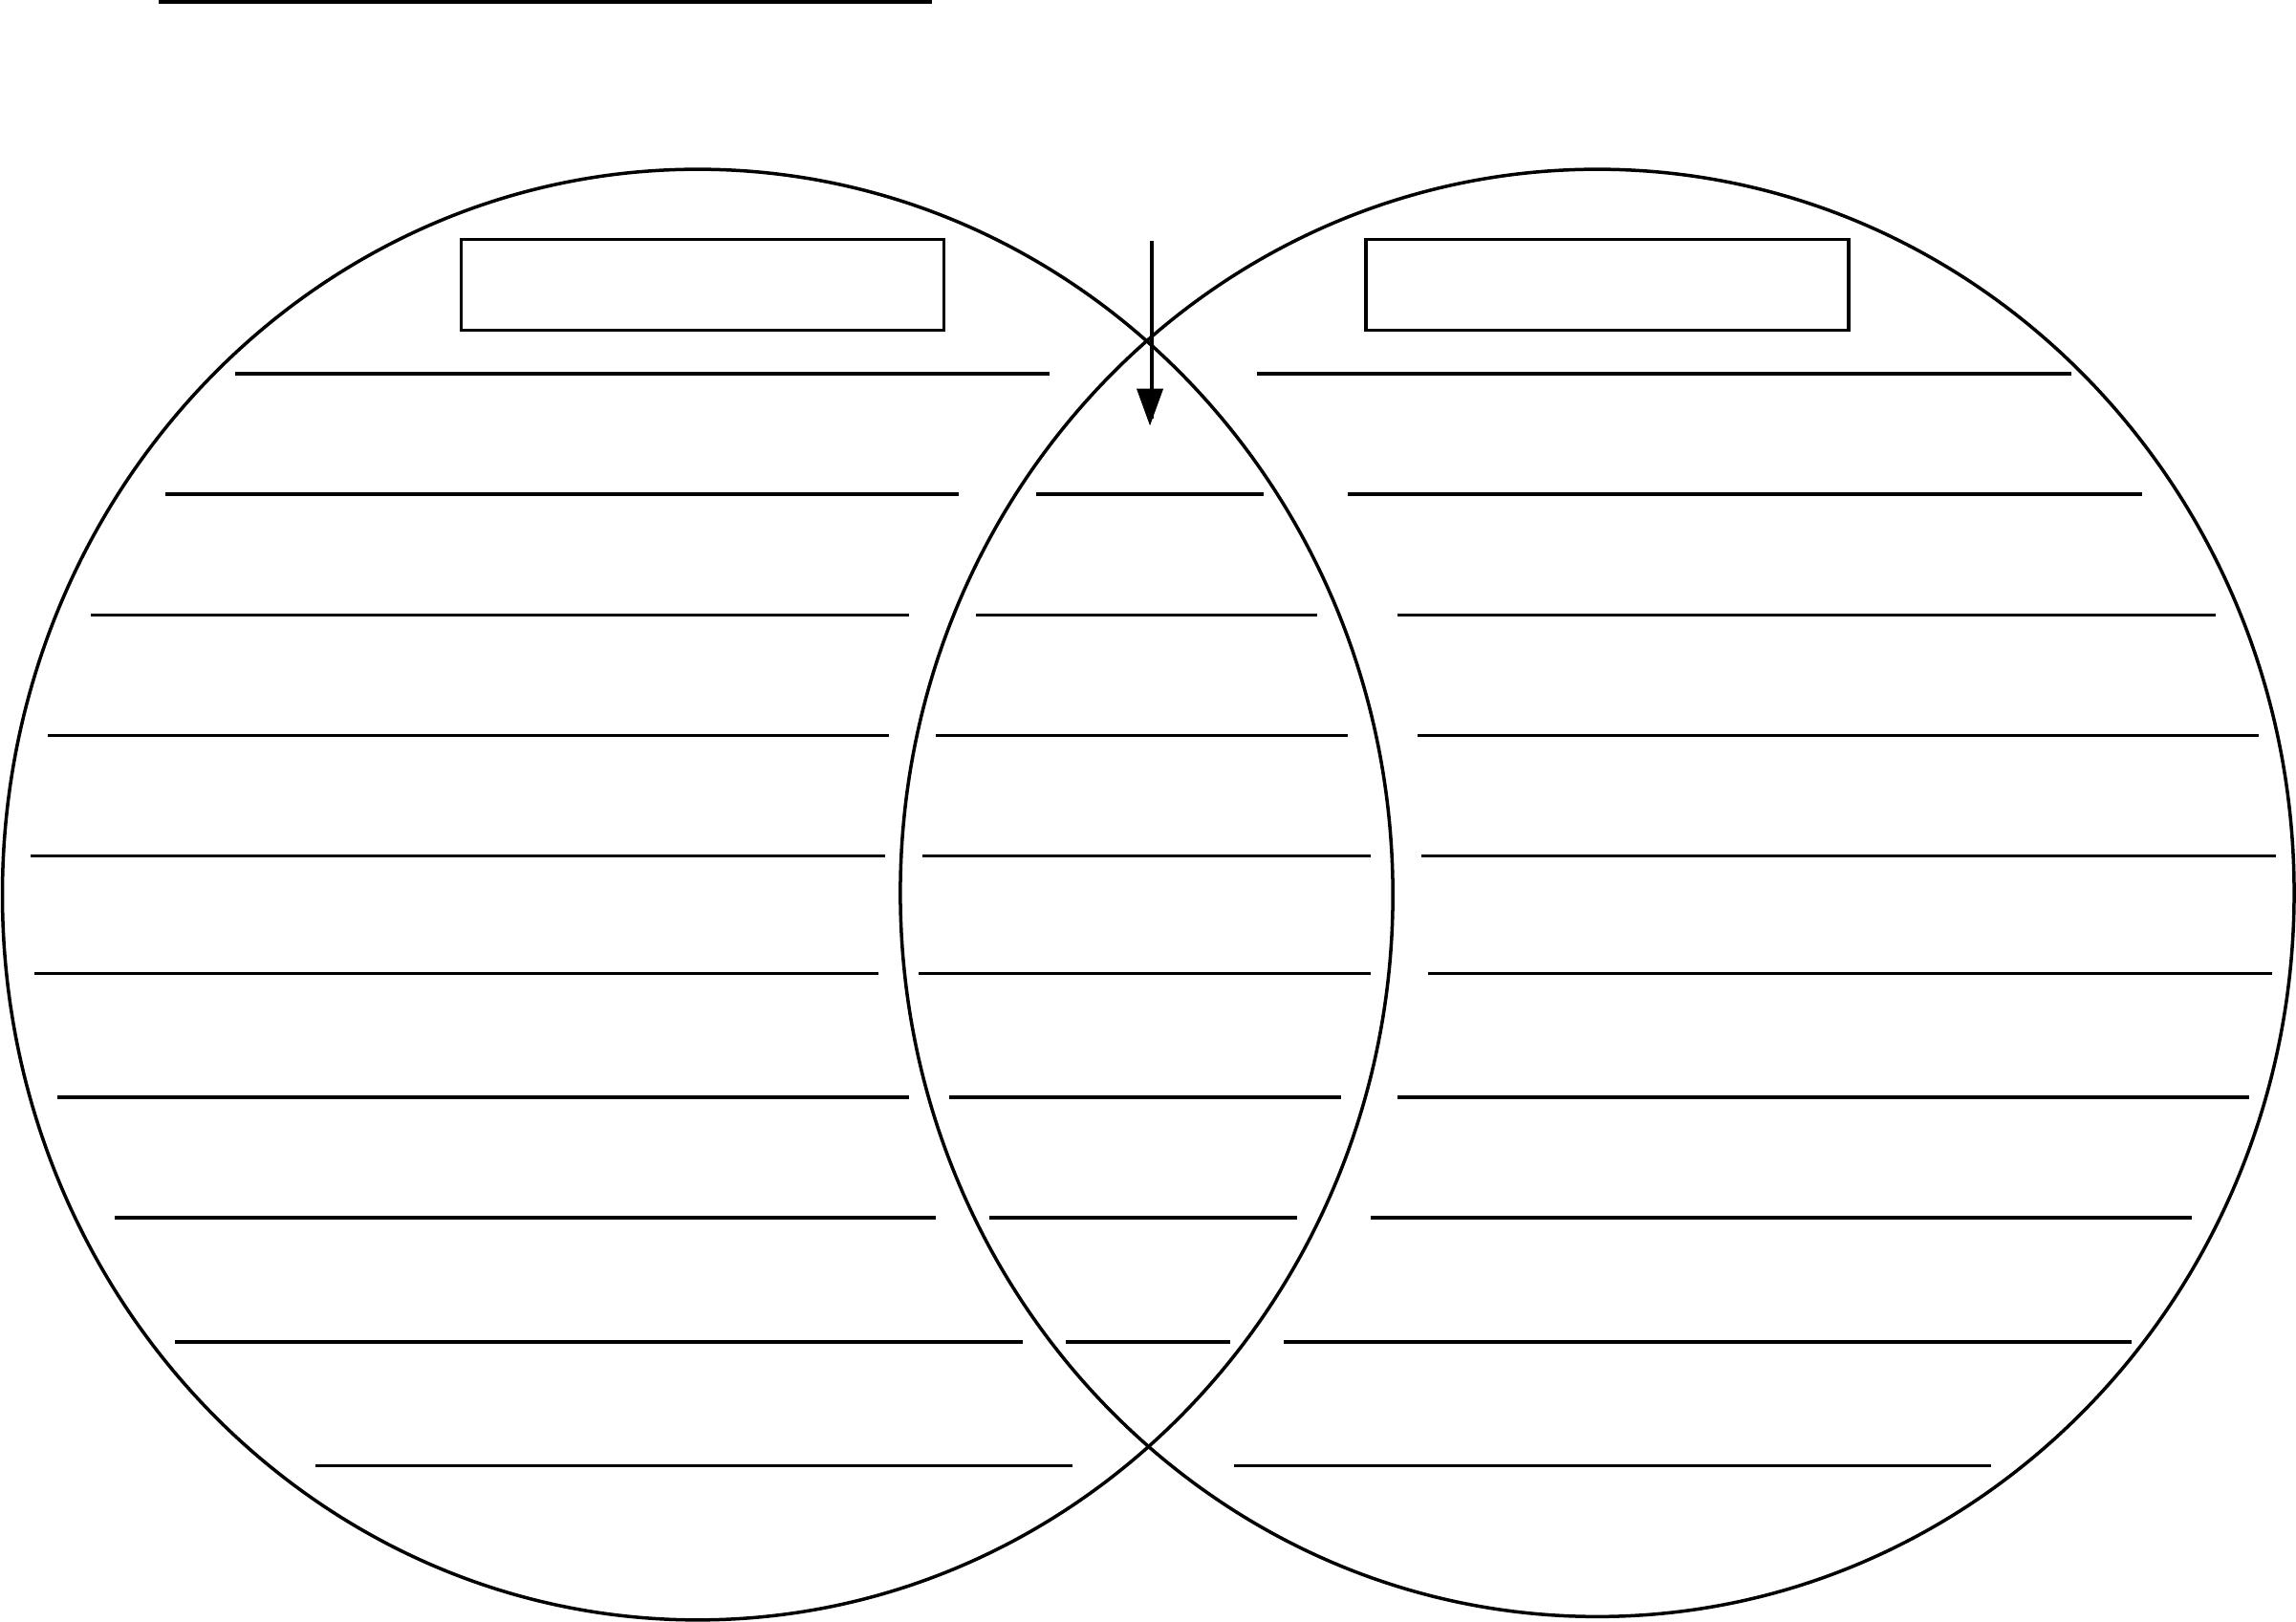 Venn Diagram Template (Character) Free Download - Free Printable Venn Diagram